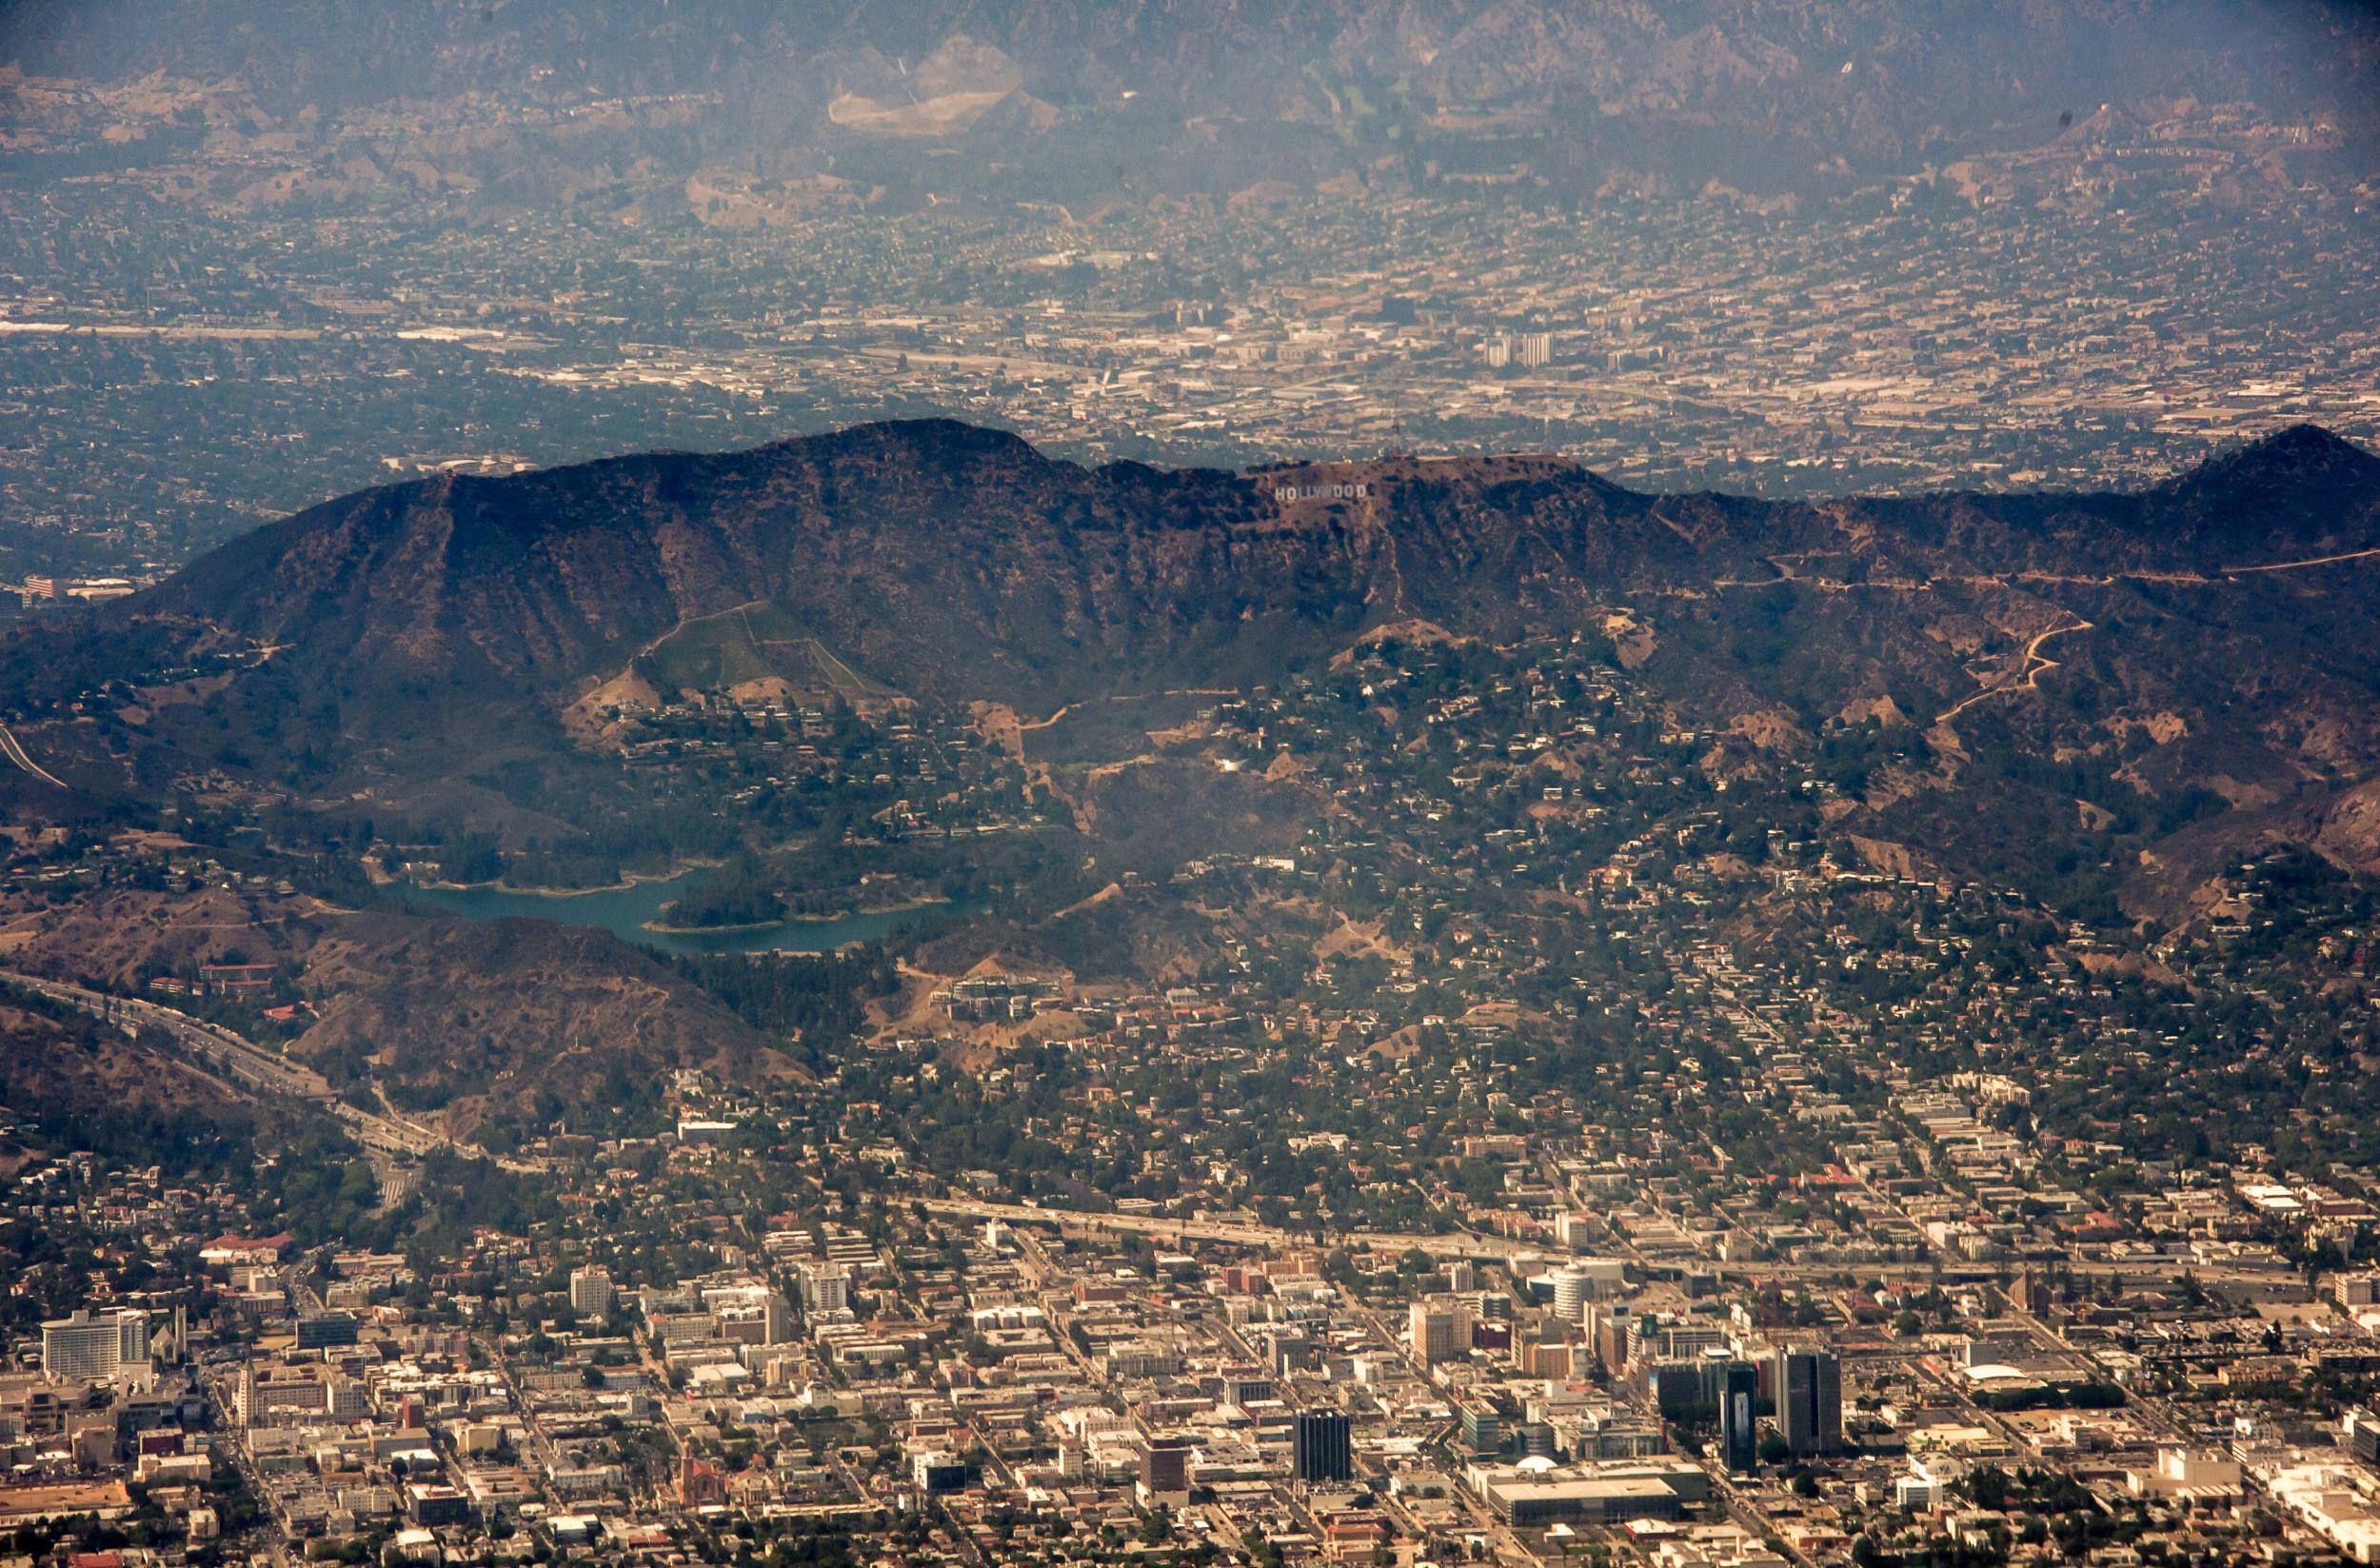 Los Angeles Earthquake Granada Hills Struck By 3 6 Magnitude Shake